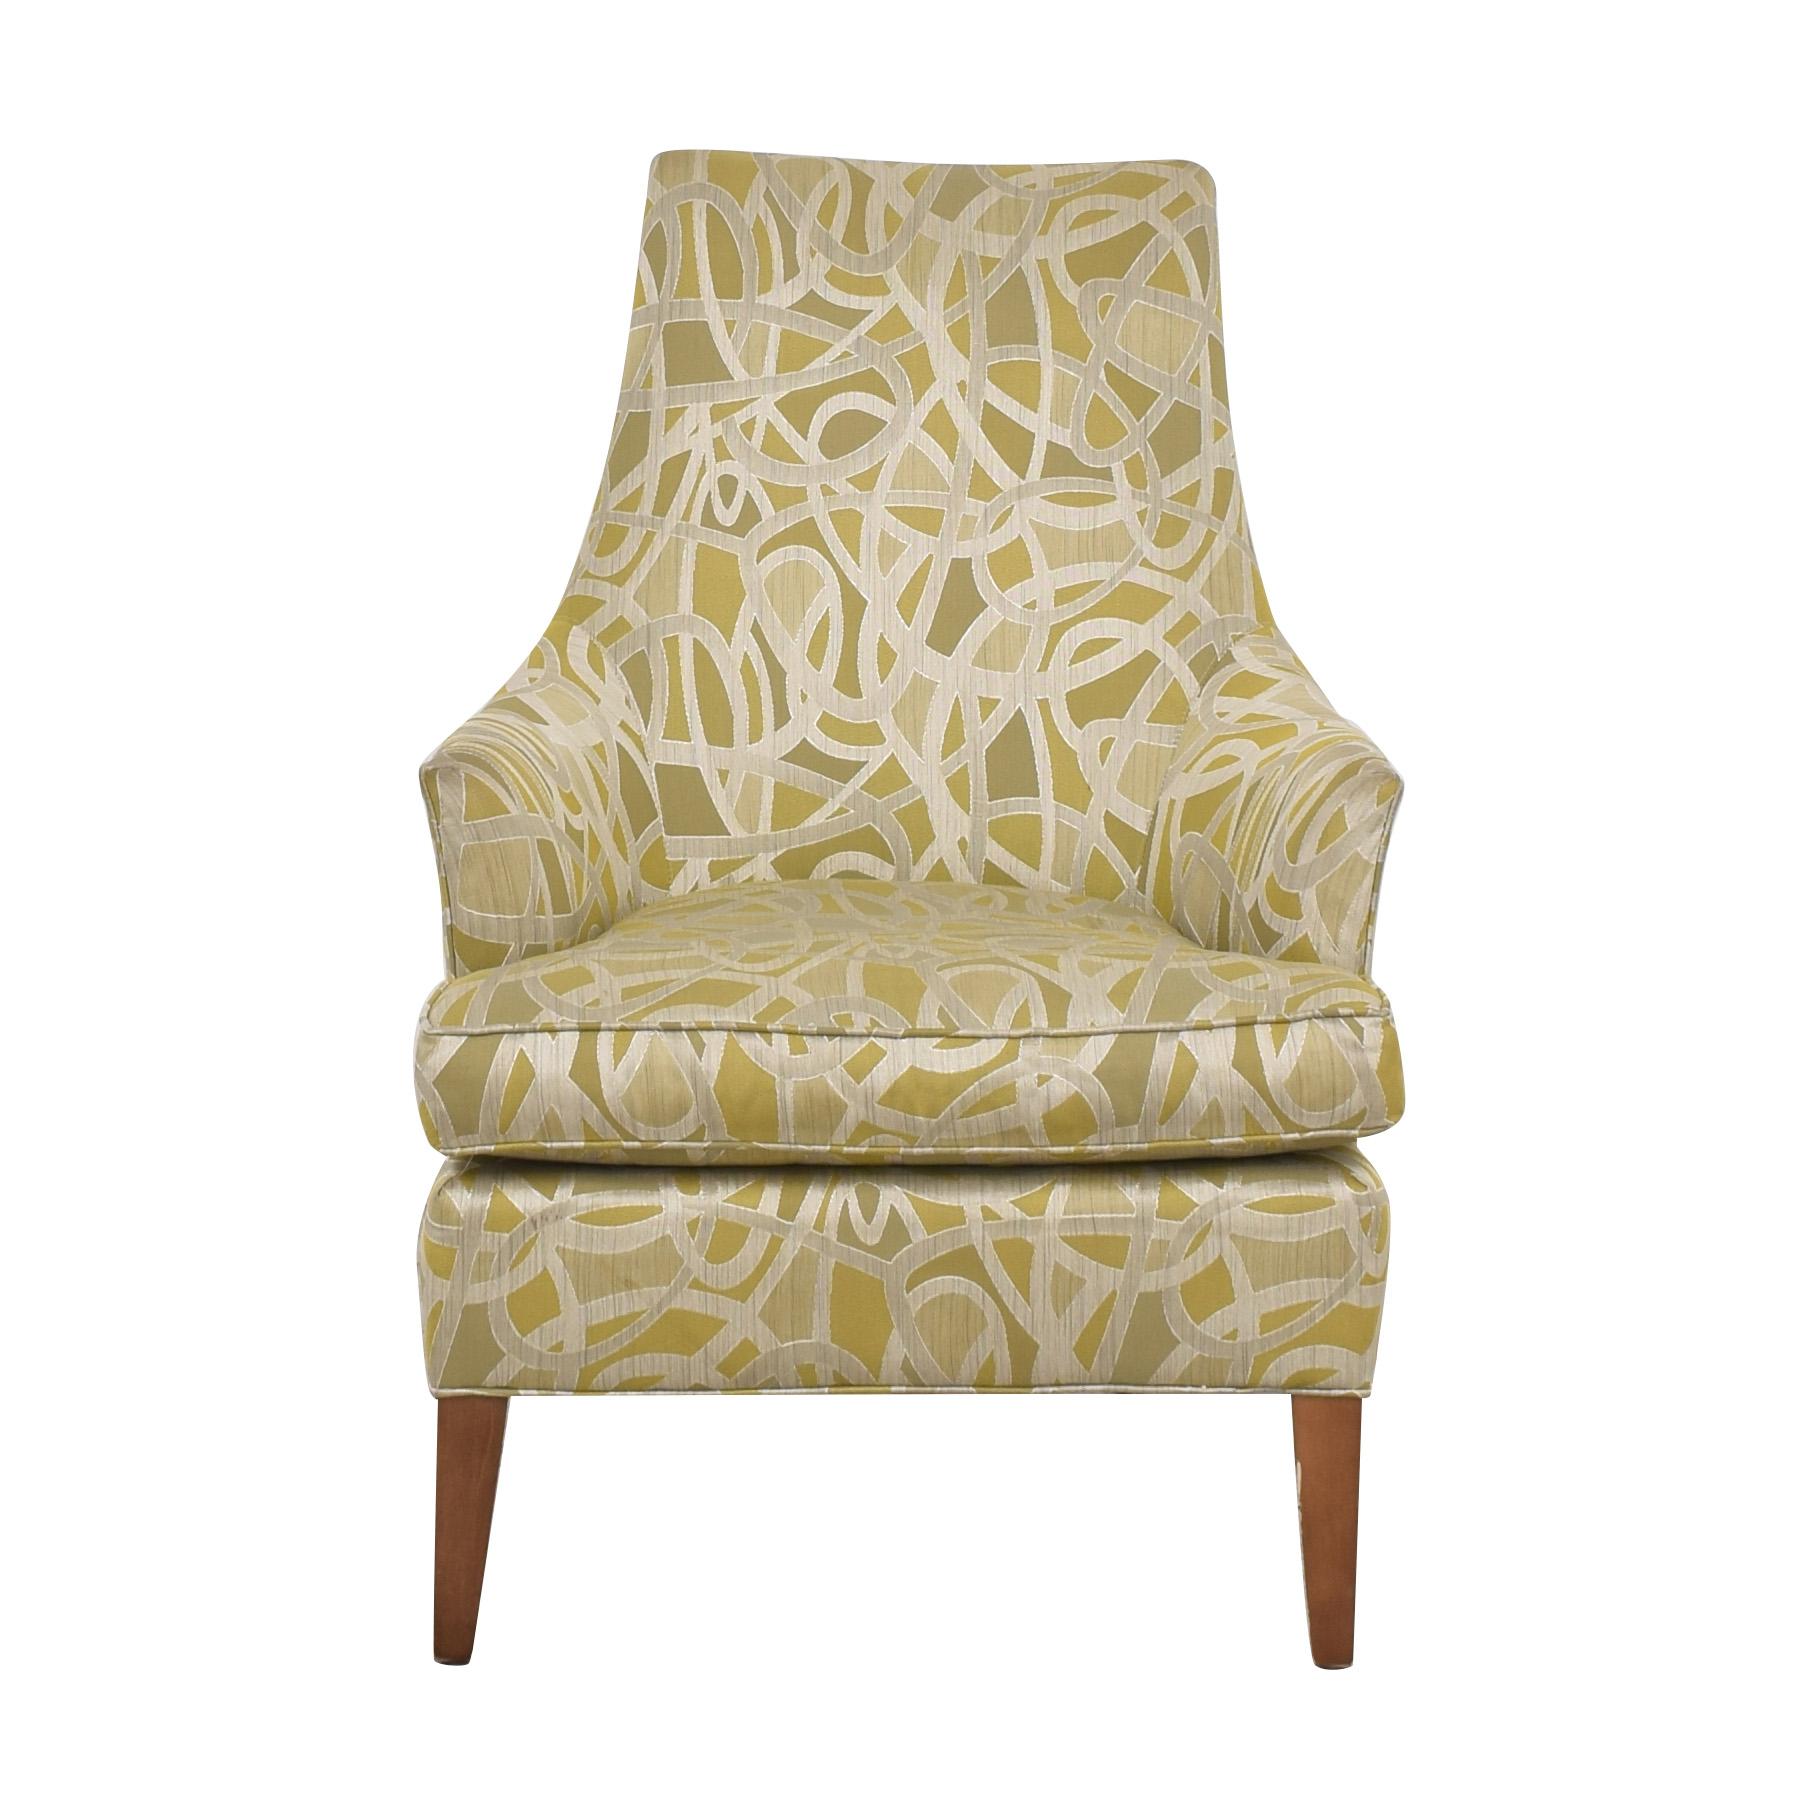 Mitchell Gold + Bob Williams Mitchell Gold + Bob Williams Dana Chair coupon